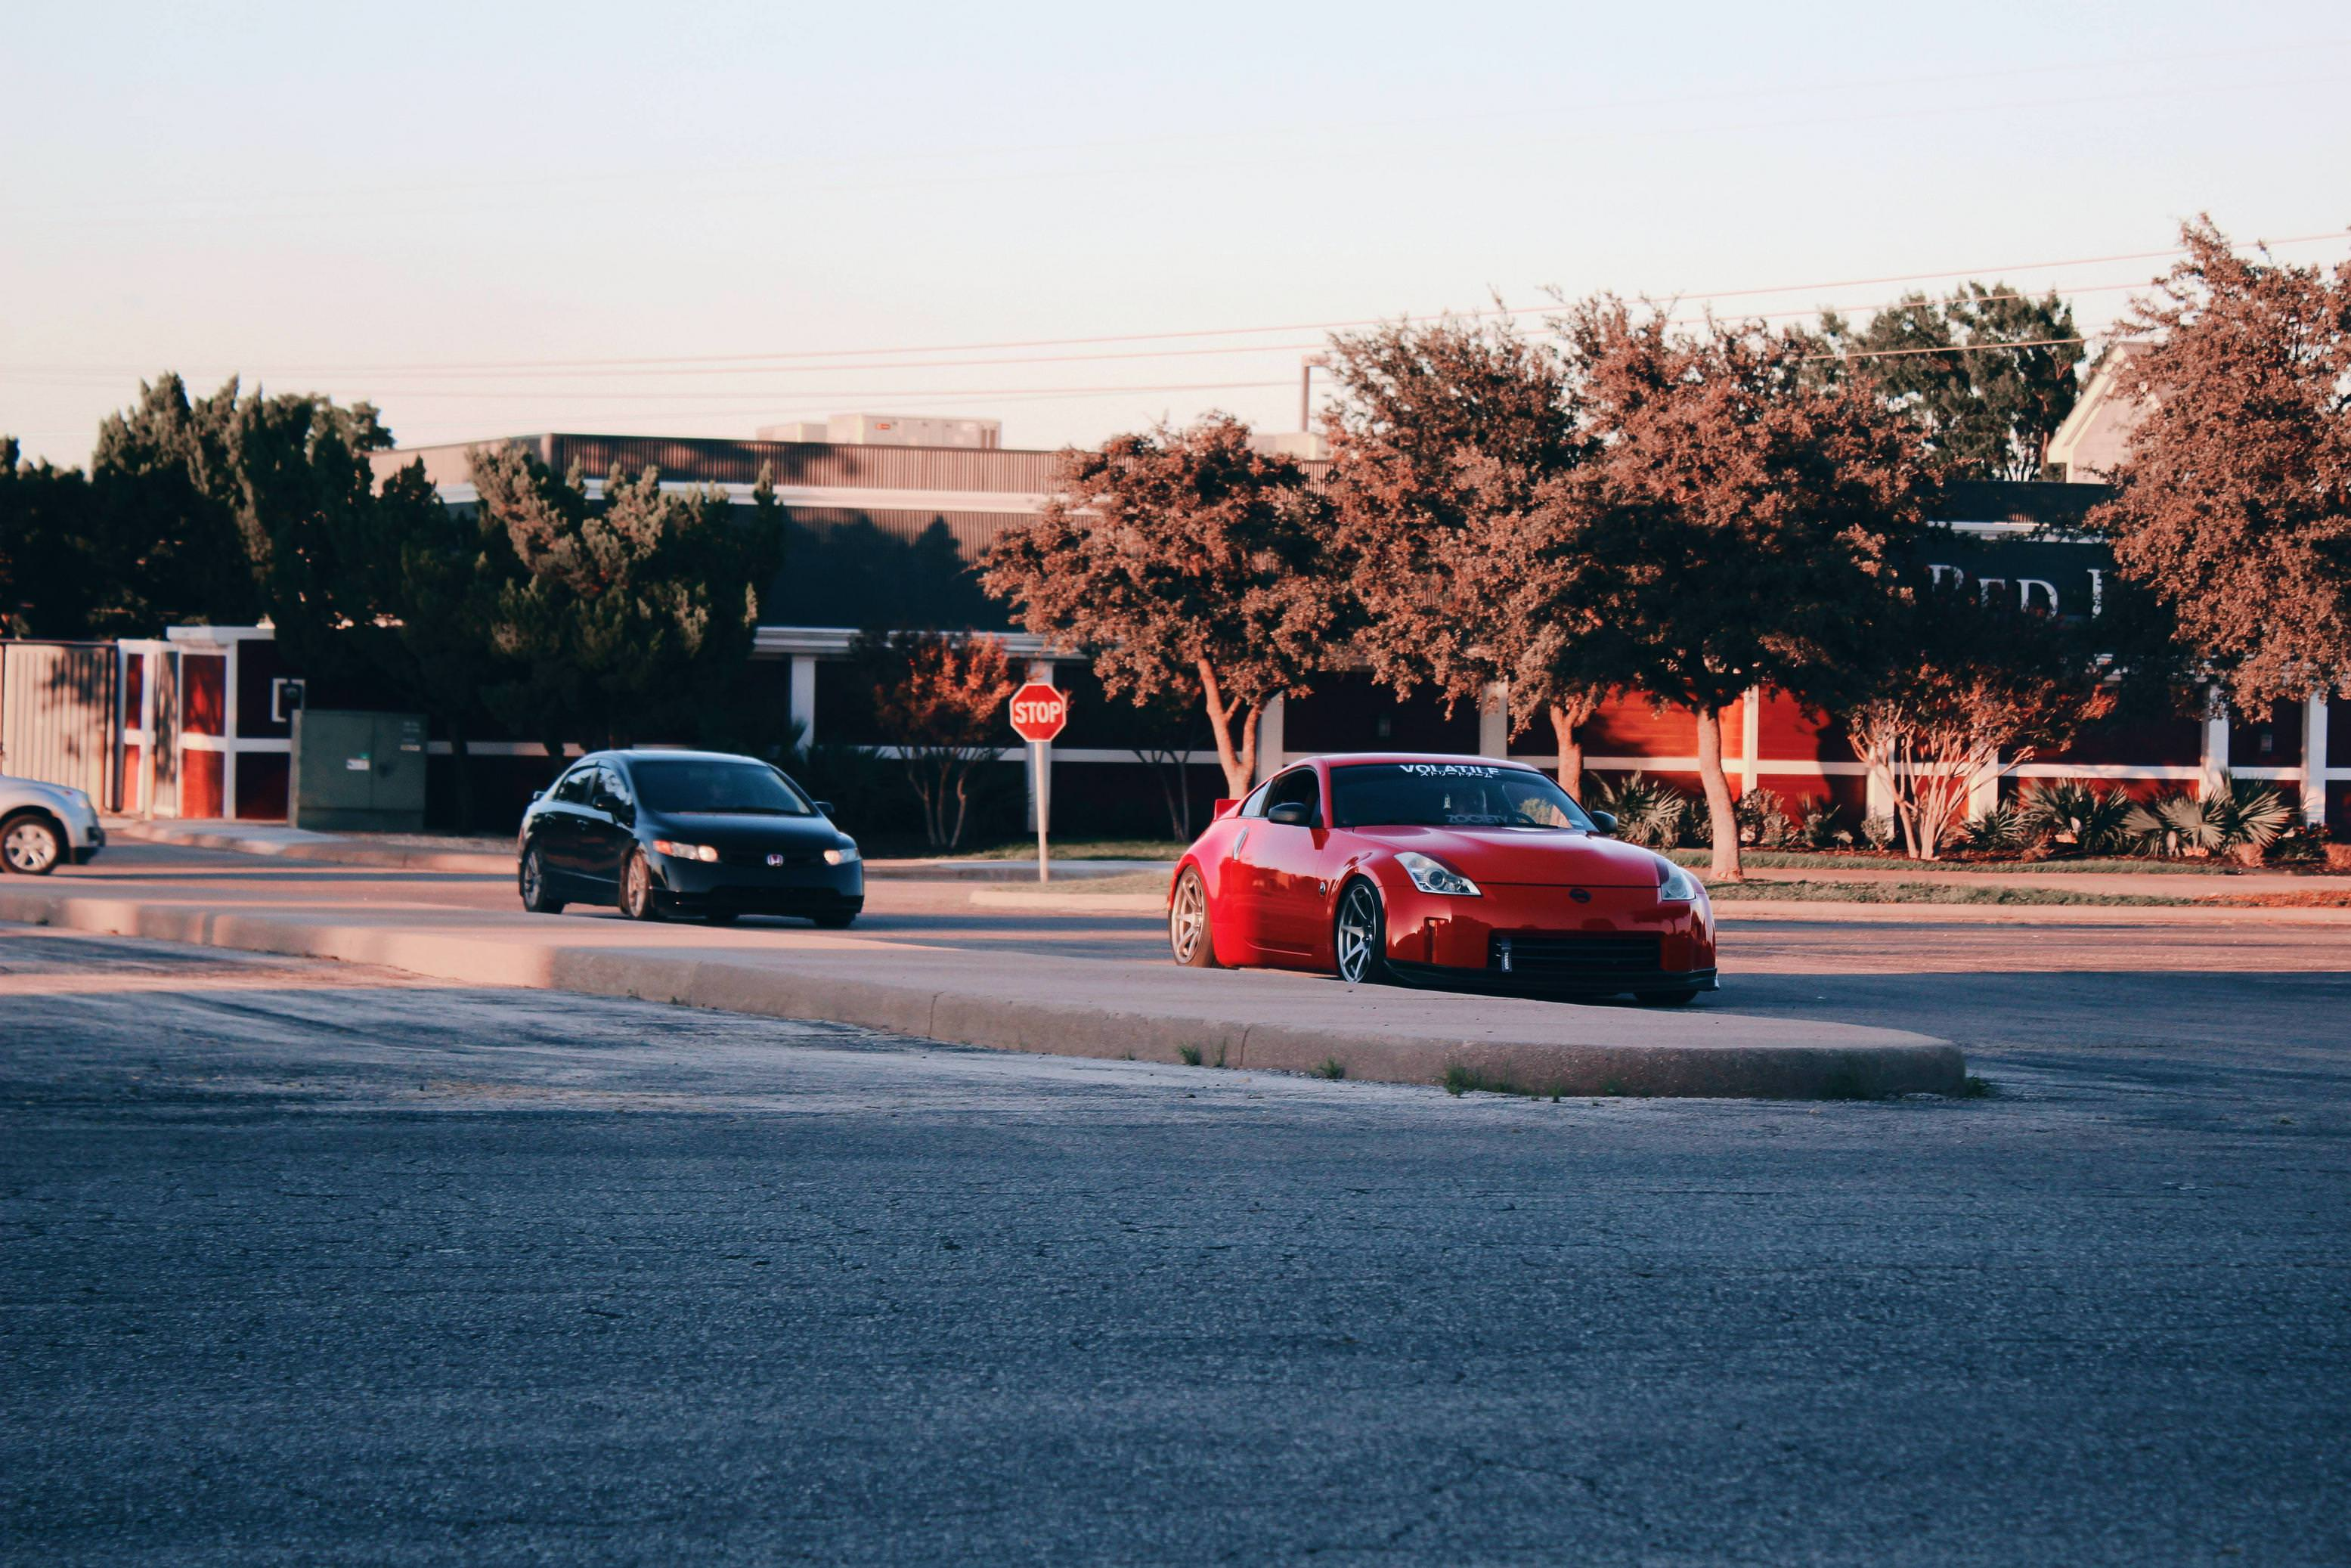 Fa5 a 350z from my local car club   Imgur 3110x2074